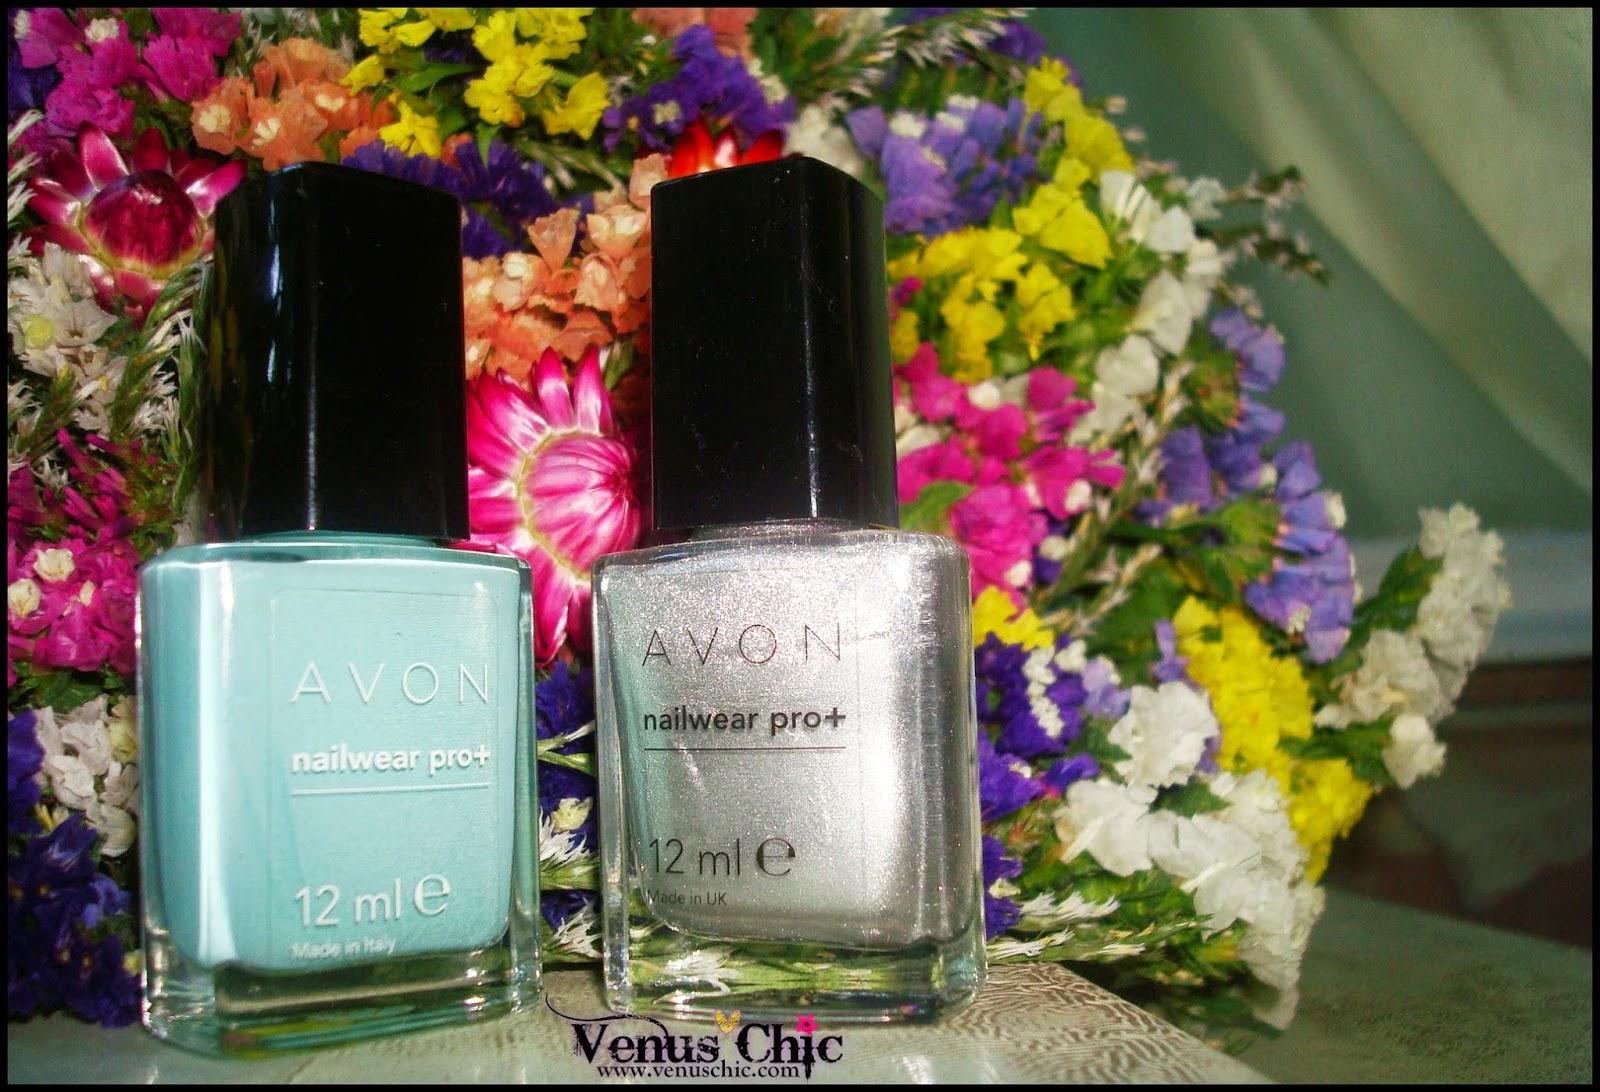 Avon Nailwear pro+ Serene & Starry Sky